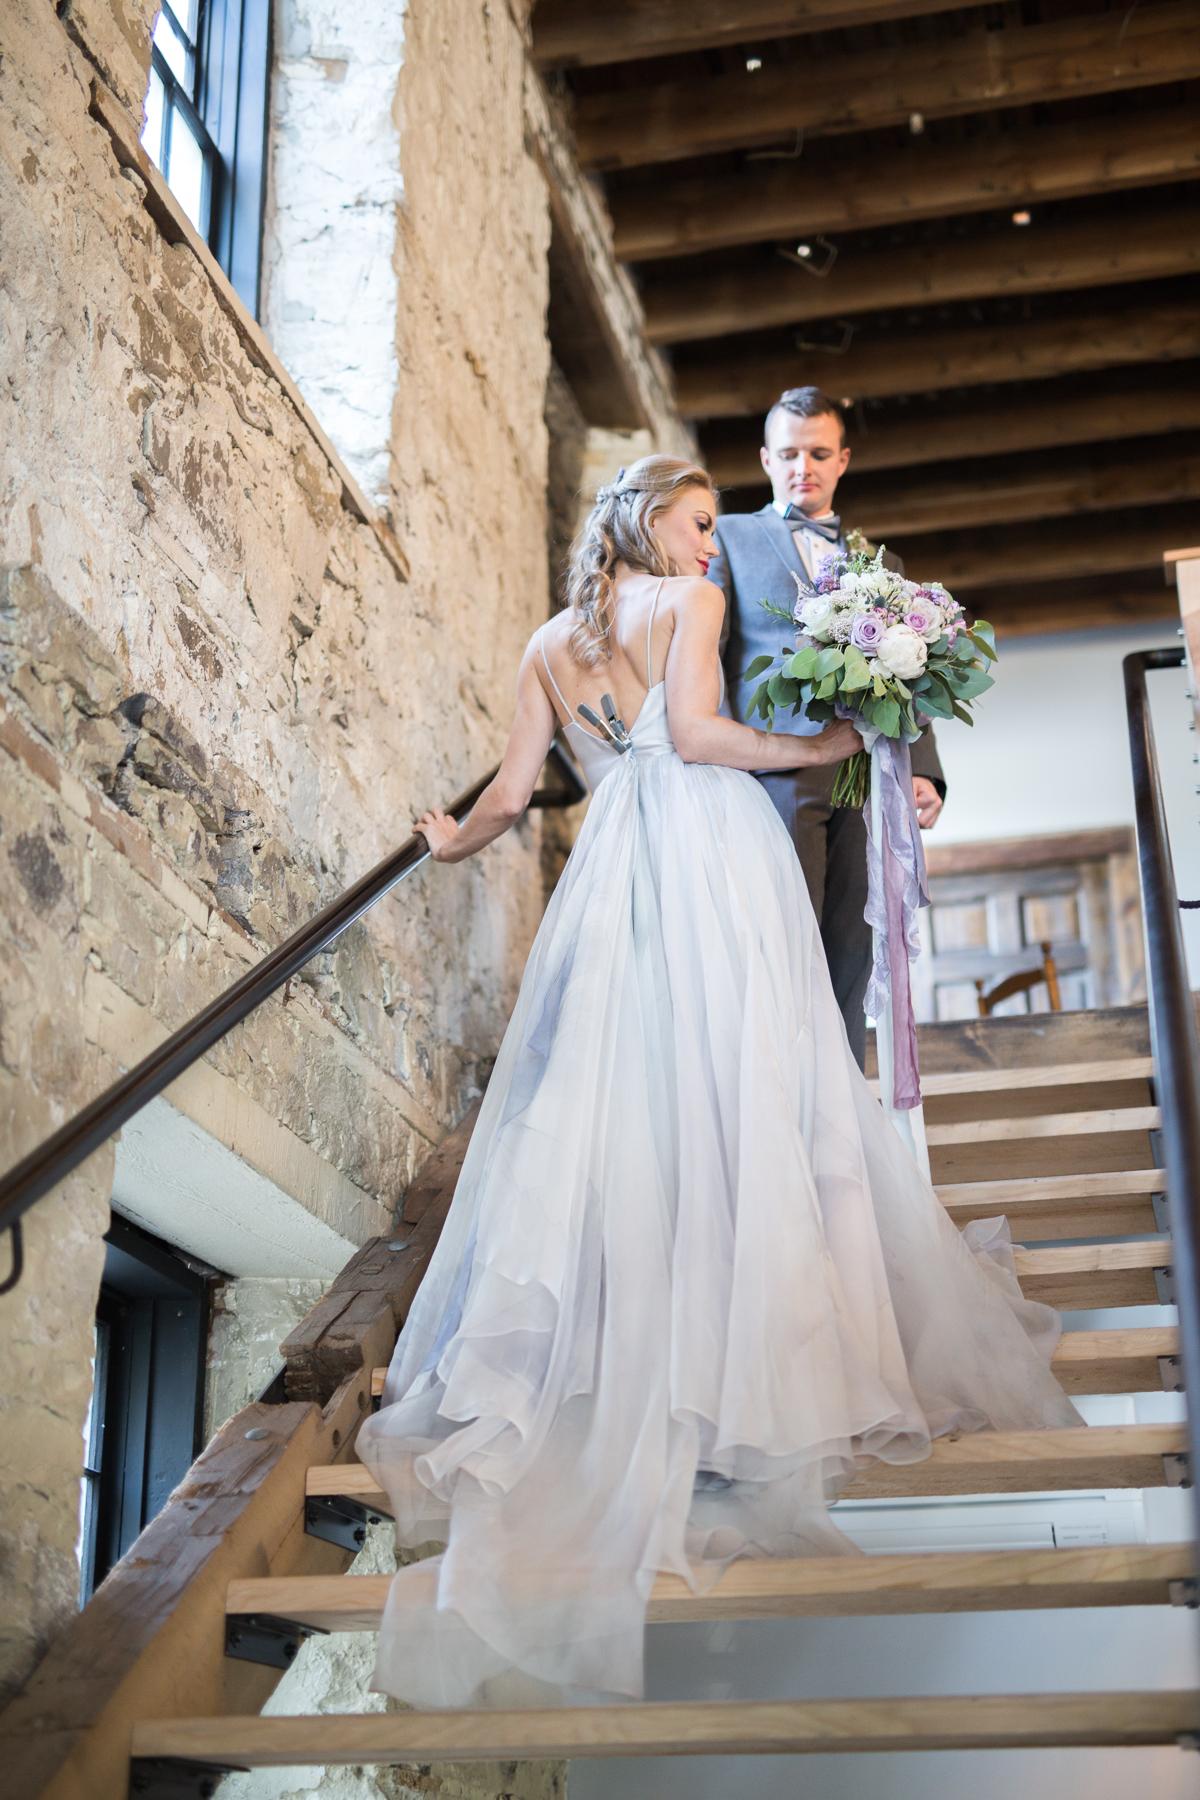 Nick-Natasha-Studio-Styled-Wedding-Sinclair-of-Skaneateles-NY-1425.jpg